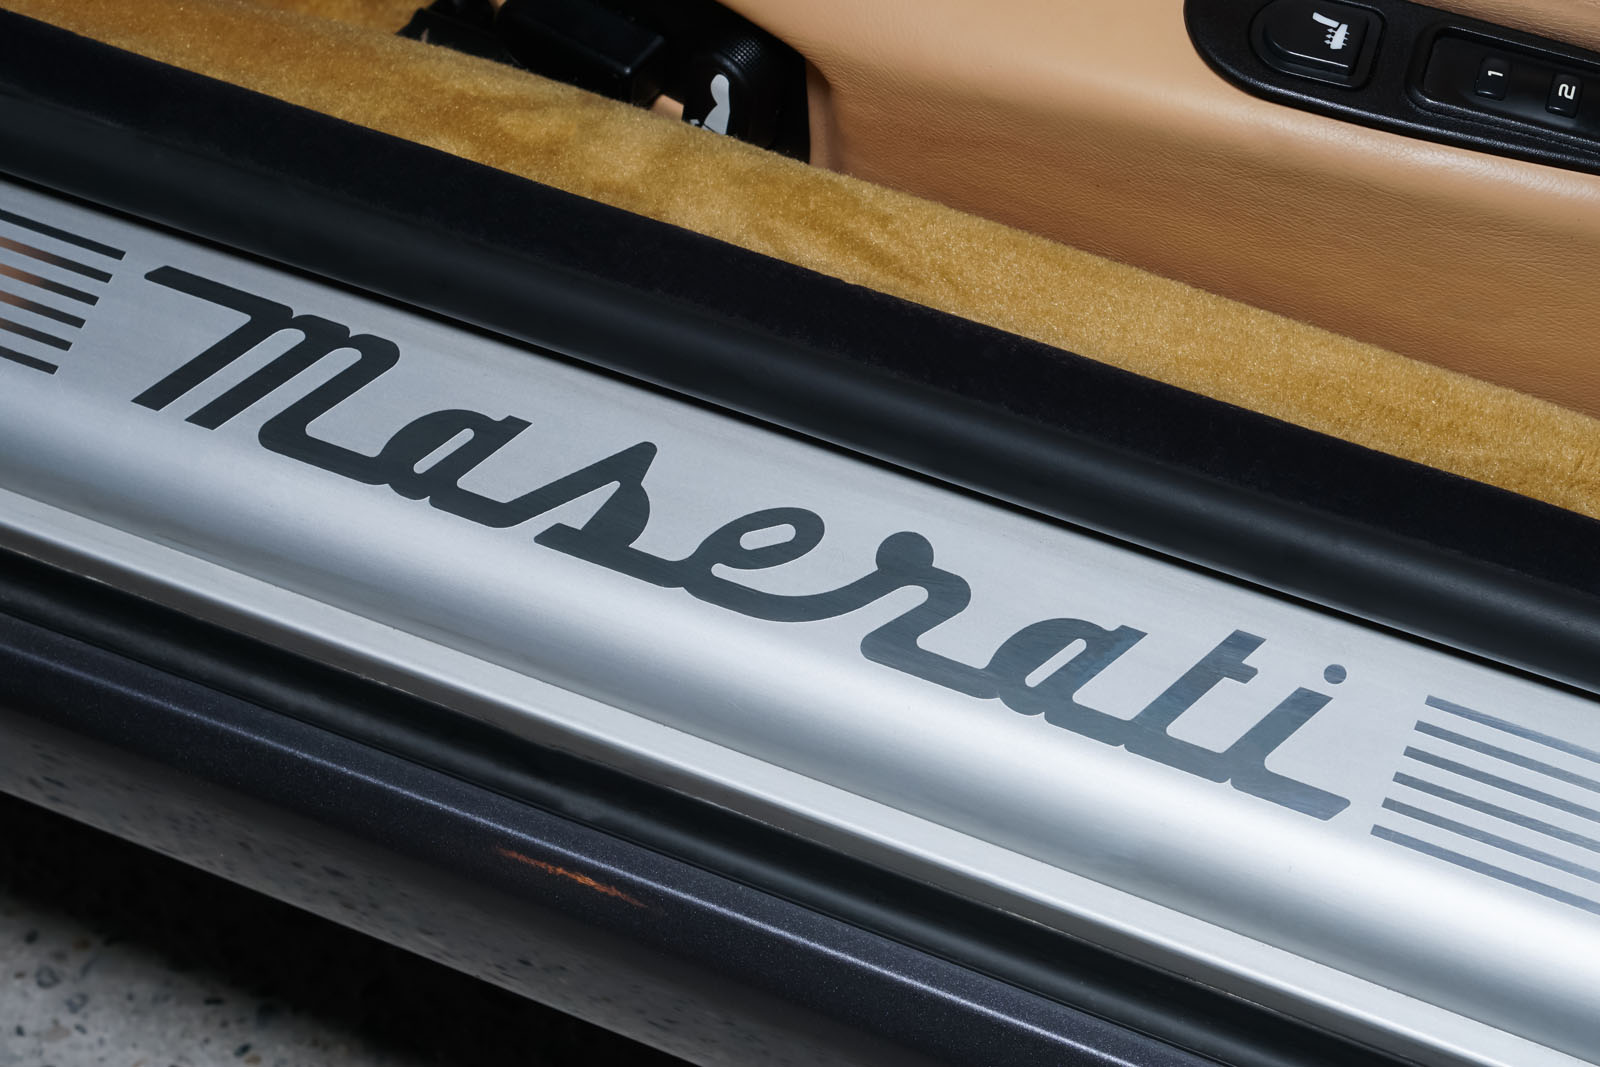 Maserati_3200_GTA_Grau_Beige_MAS-0874_9_w